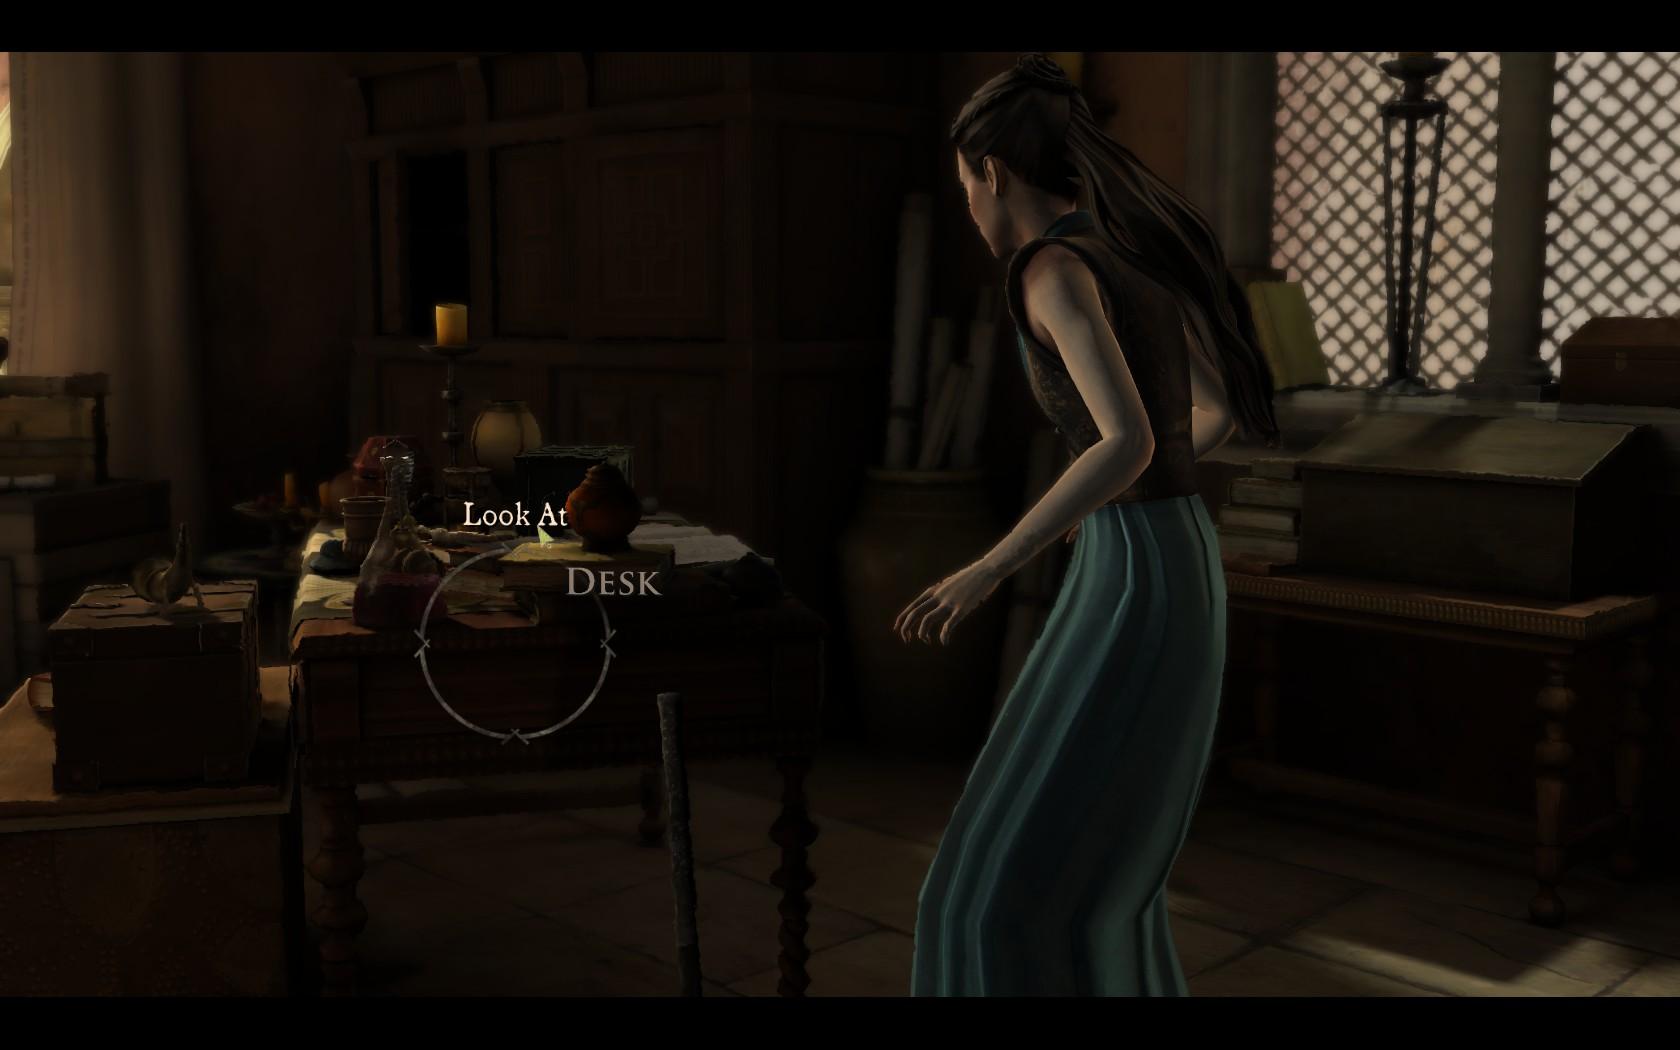 Game of Thrones: The Sword in the Darkness - ve stínu dračích křídel 107315